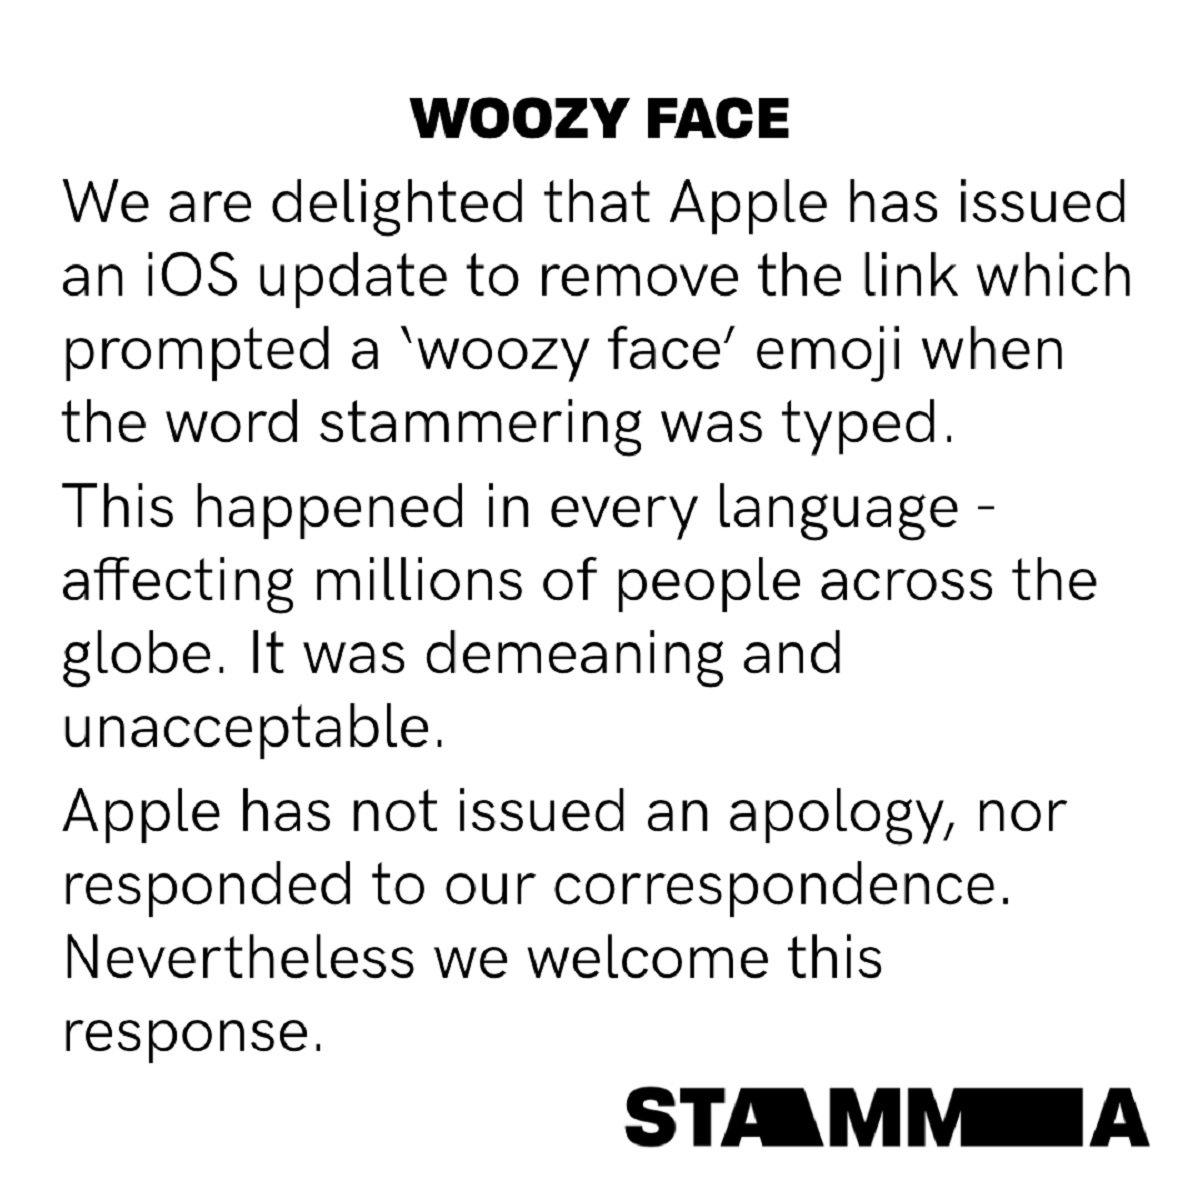 Comunicado de Stamma para Apple